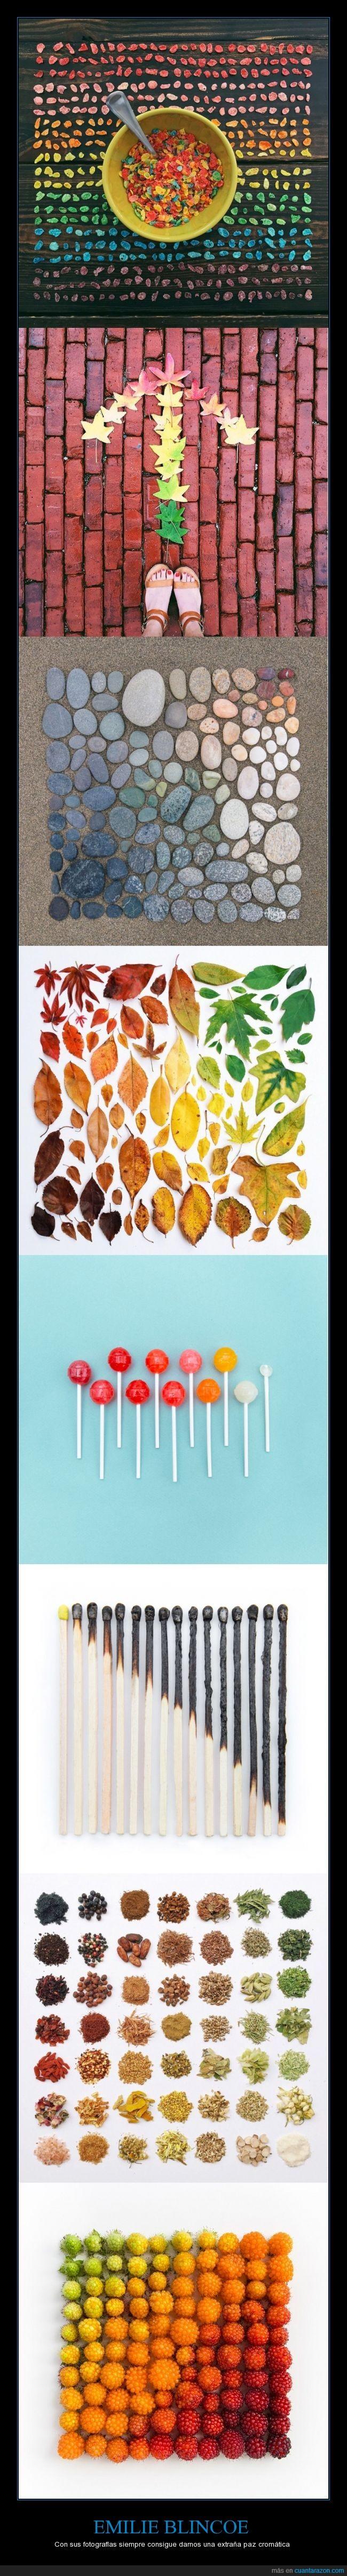 arcoiris,arrange,color,cromatico,Emilie Blincoe,ocd,ordenar,order,toc